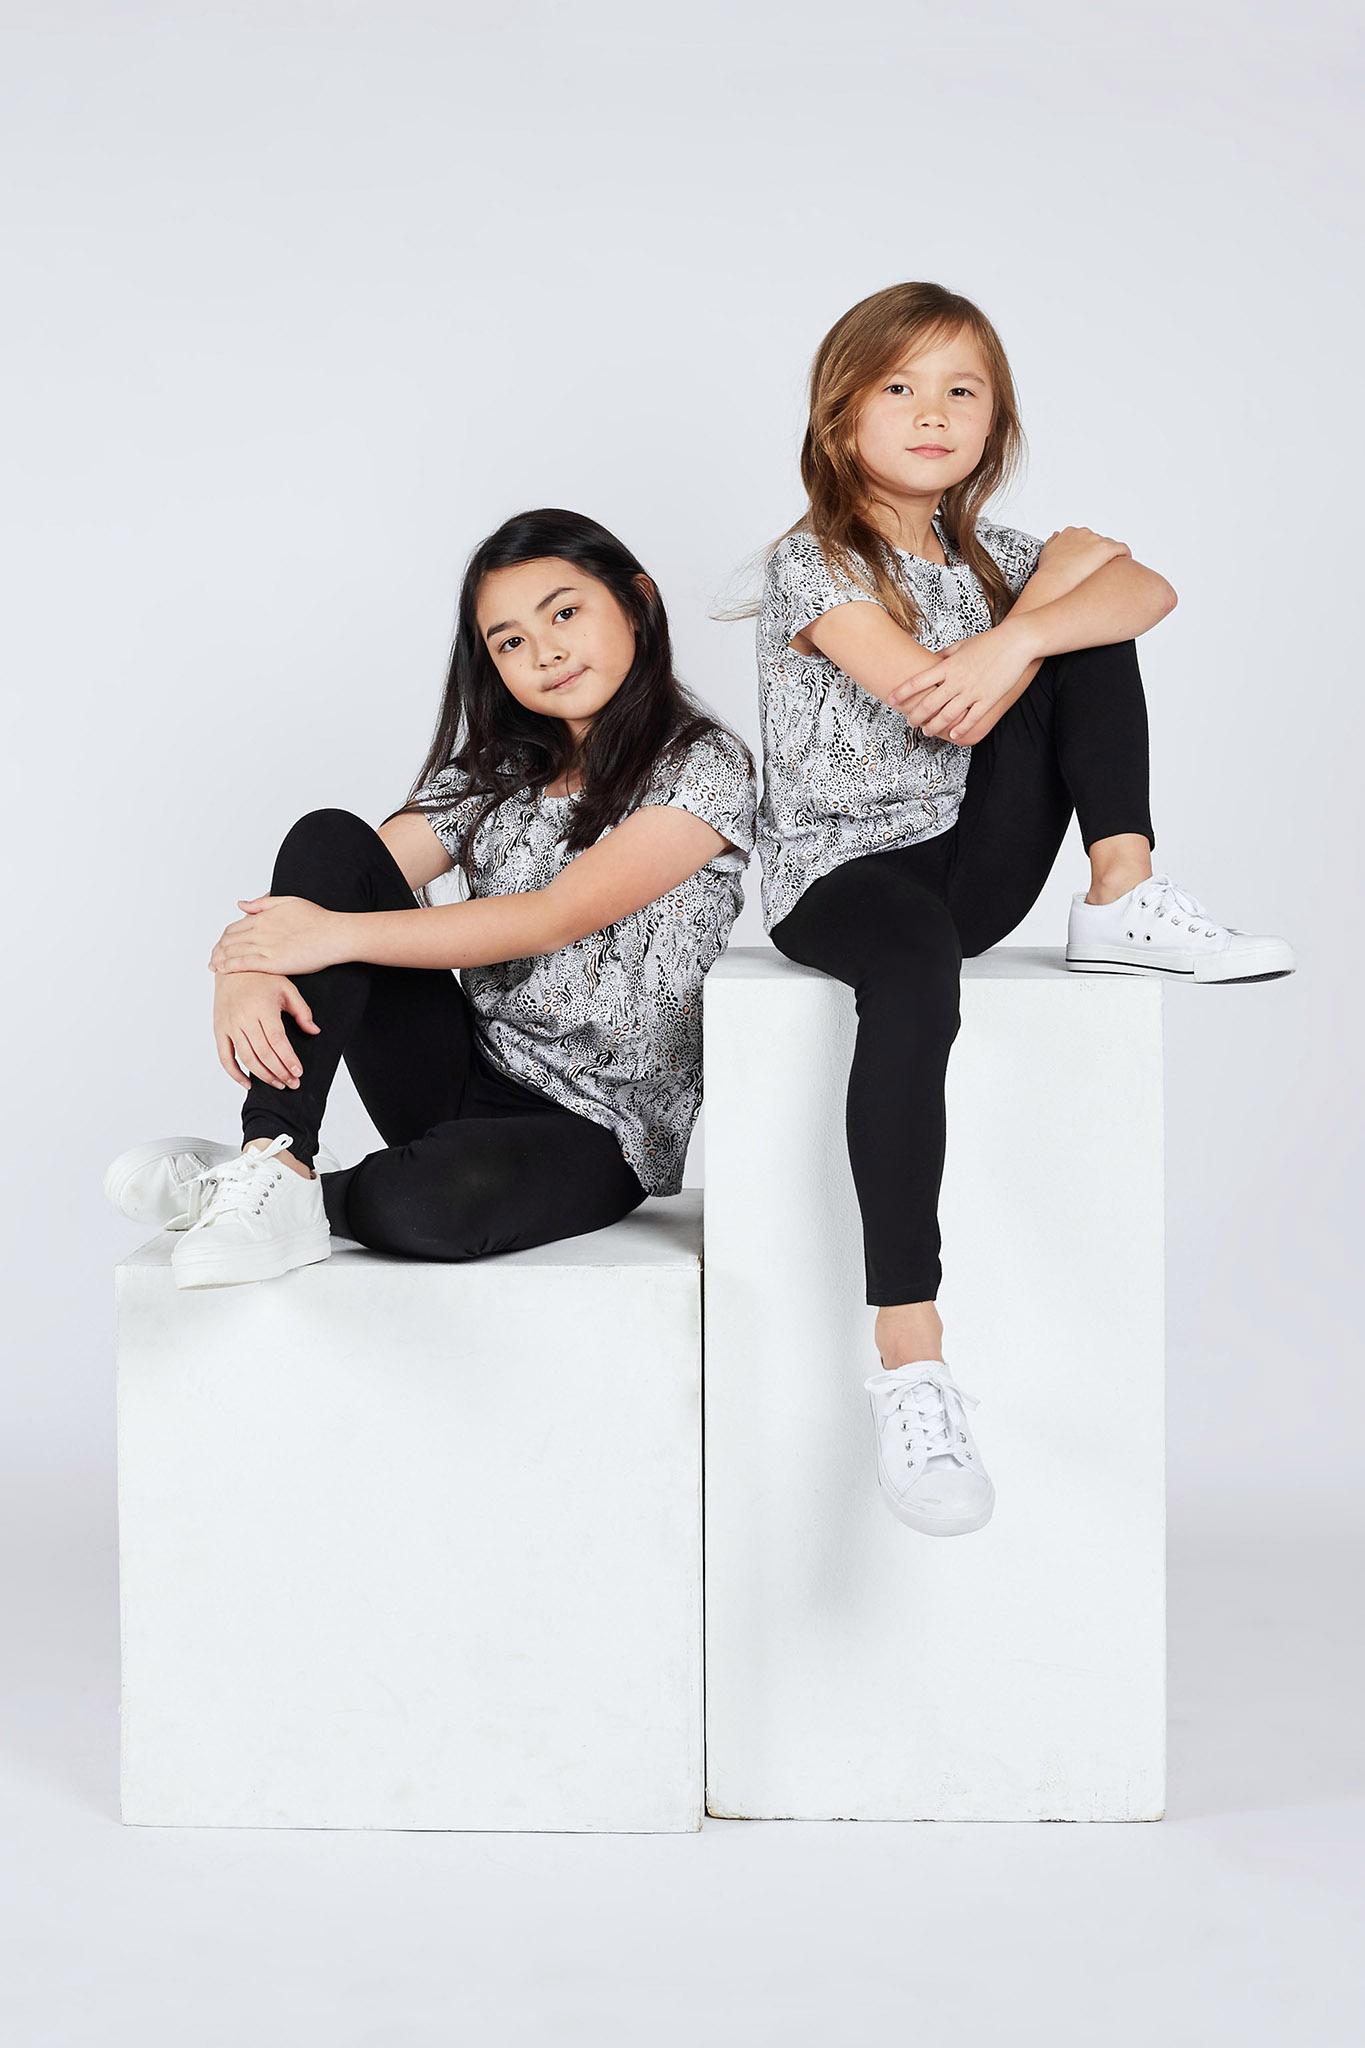 kids-studio-photography-the-jersey-shop-12